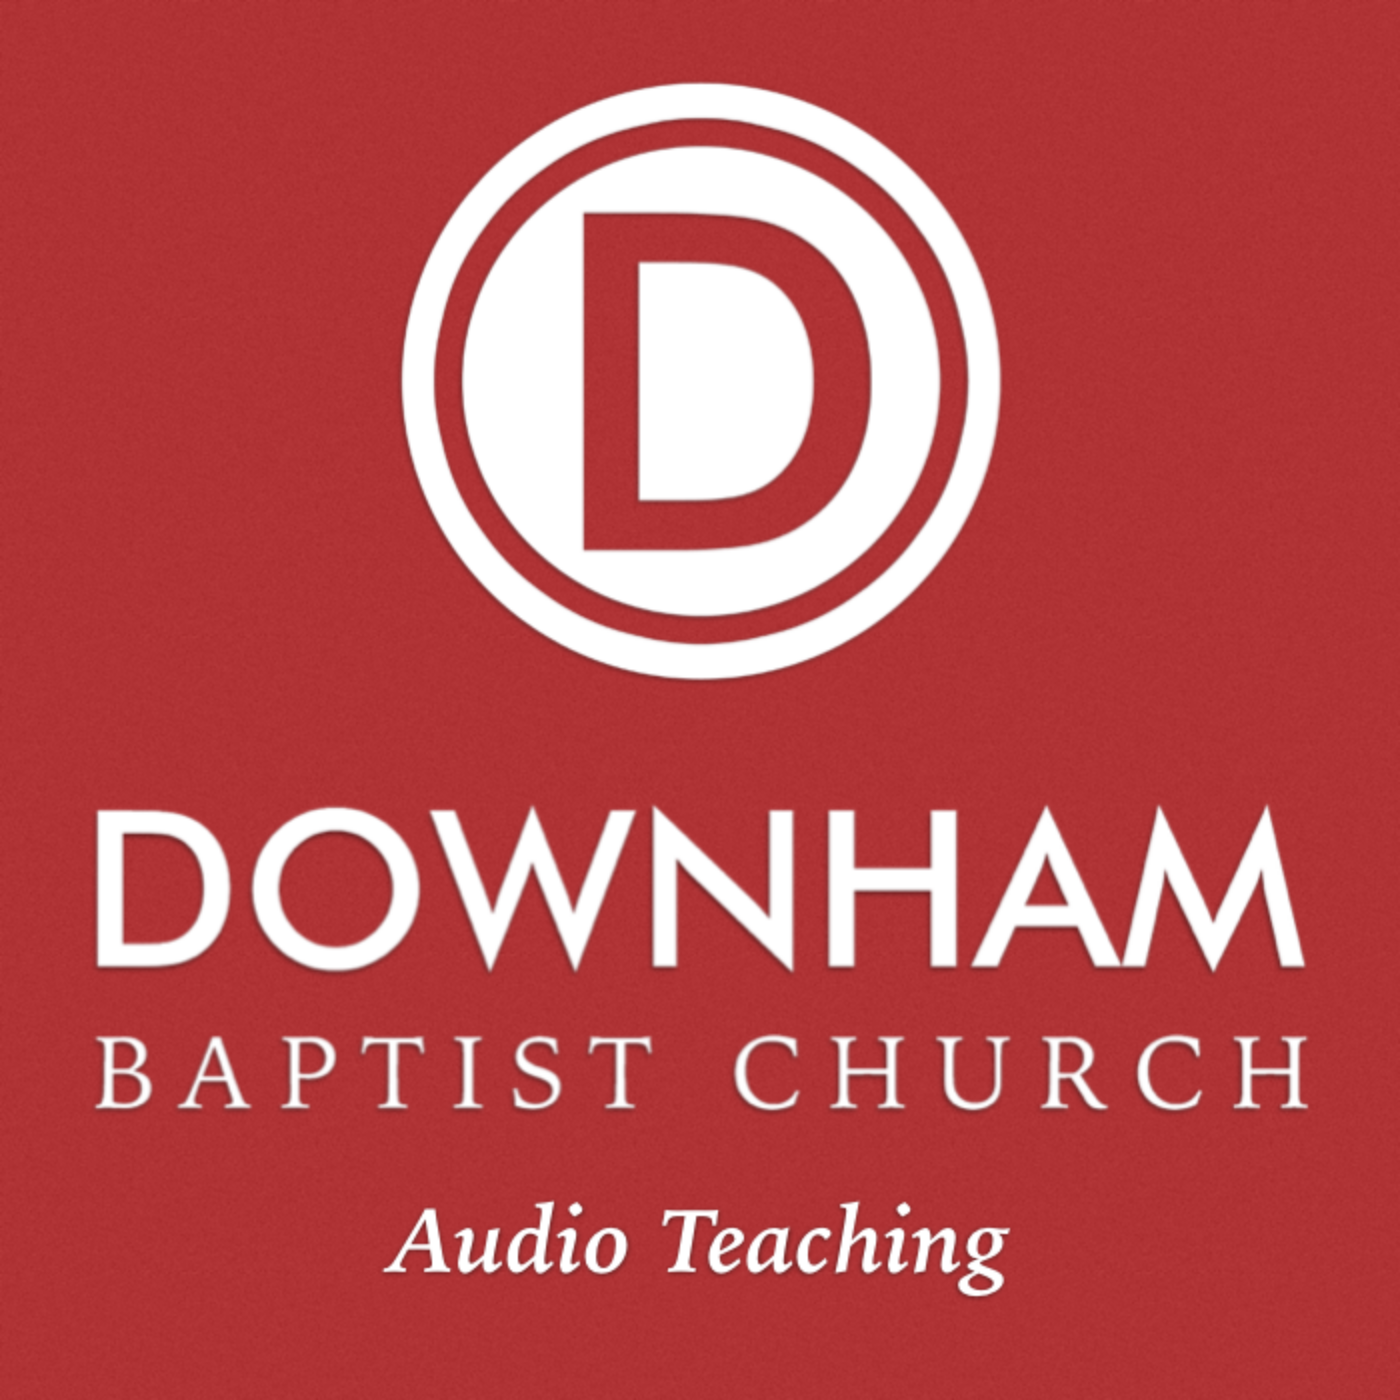 Listen - Downham Baptist Church